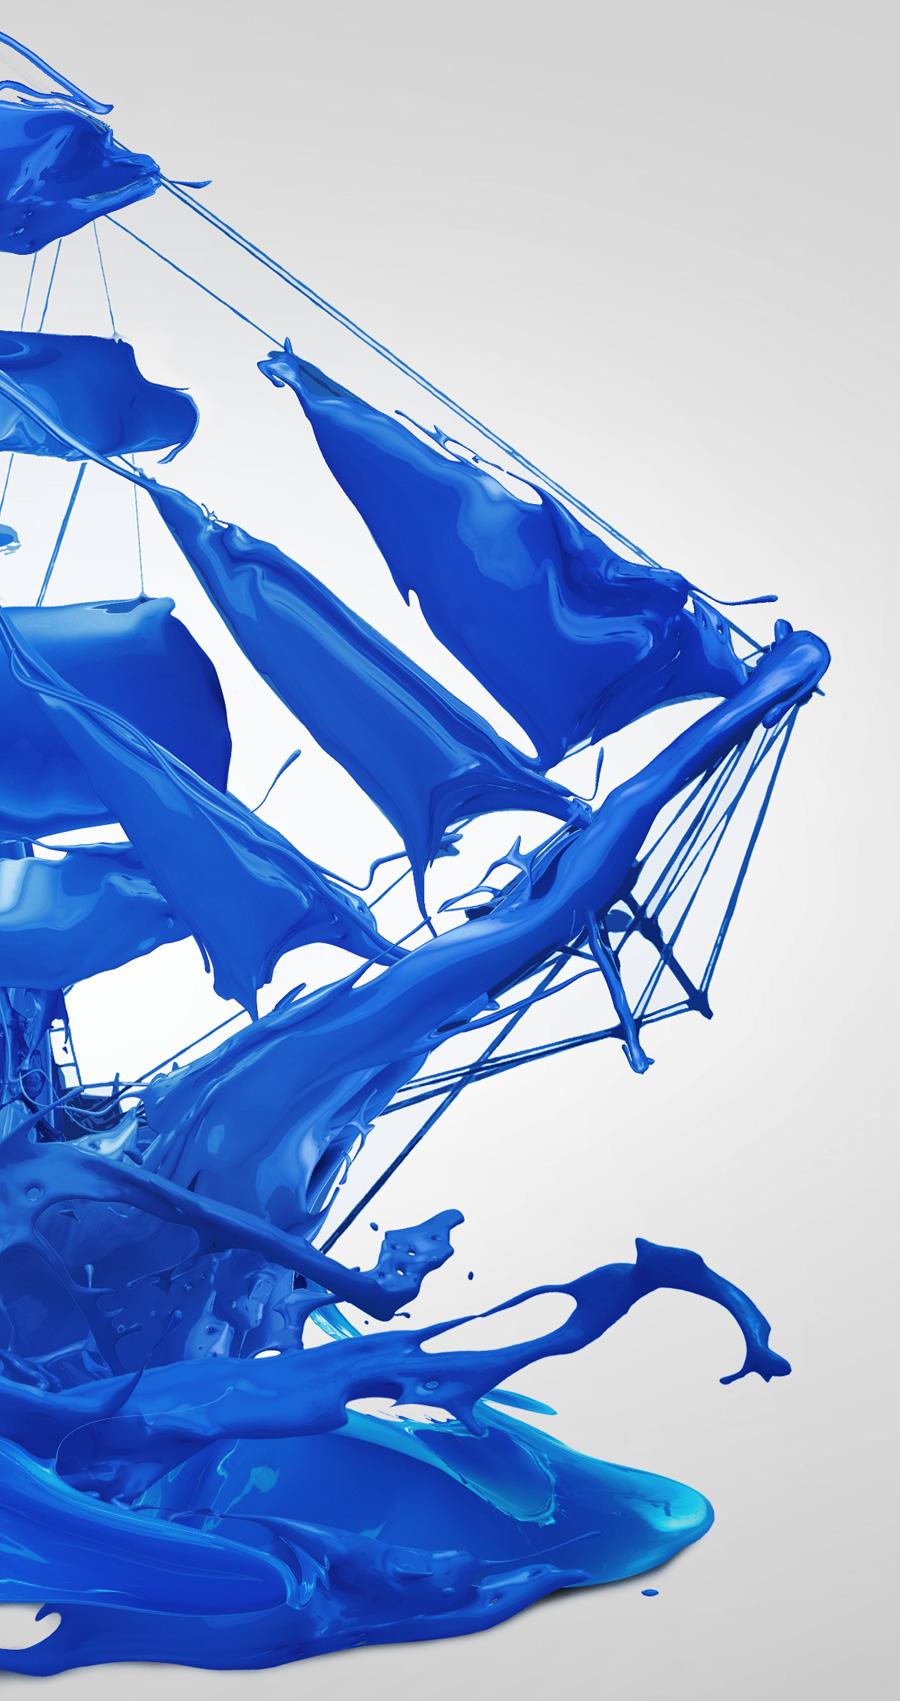 Sail  sails sailing ship sea blue paint oil paint jakarta indonesia journey